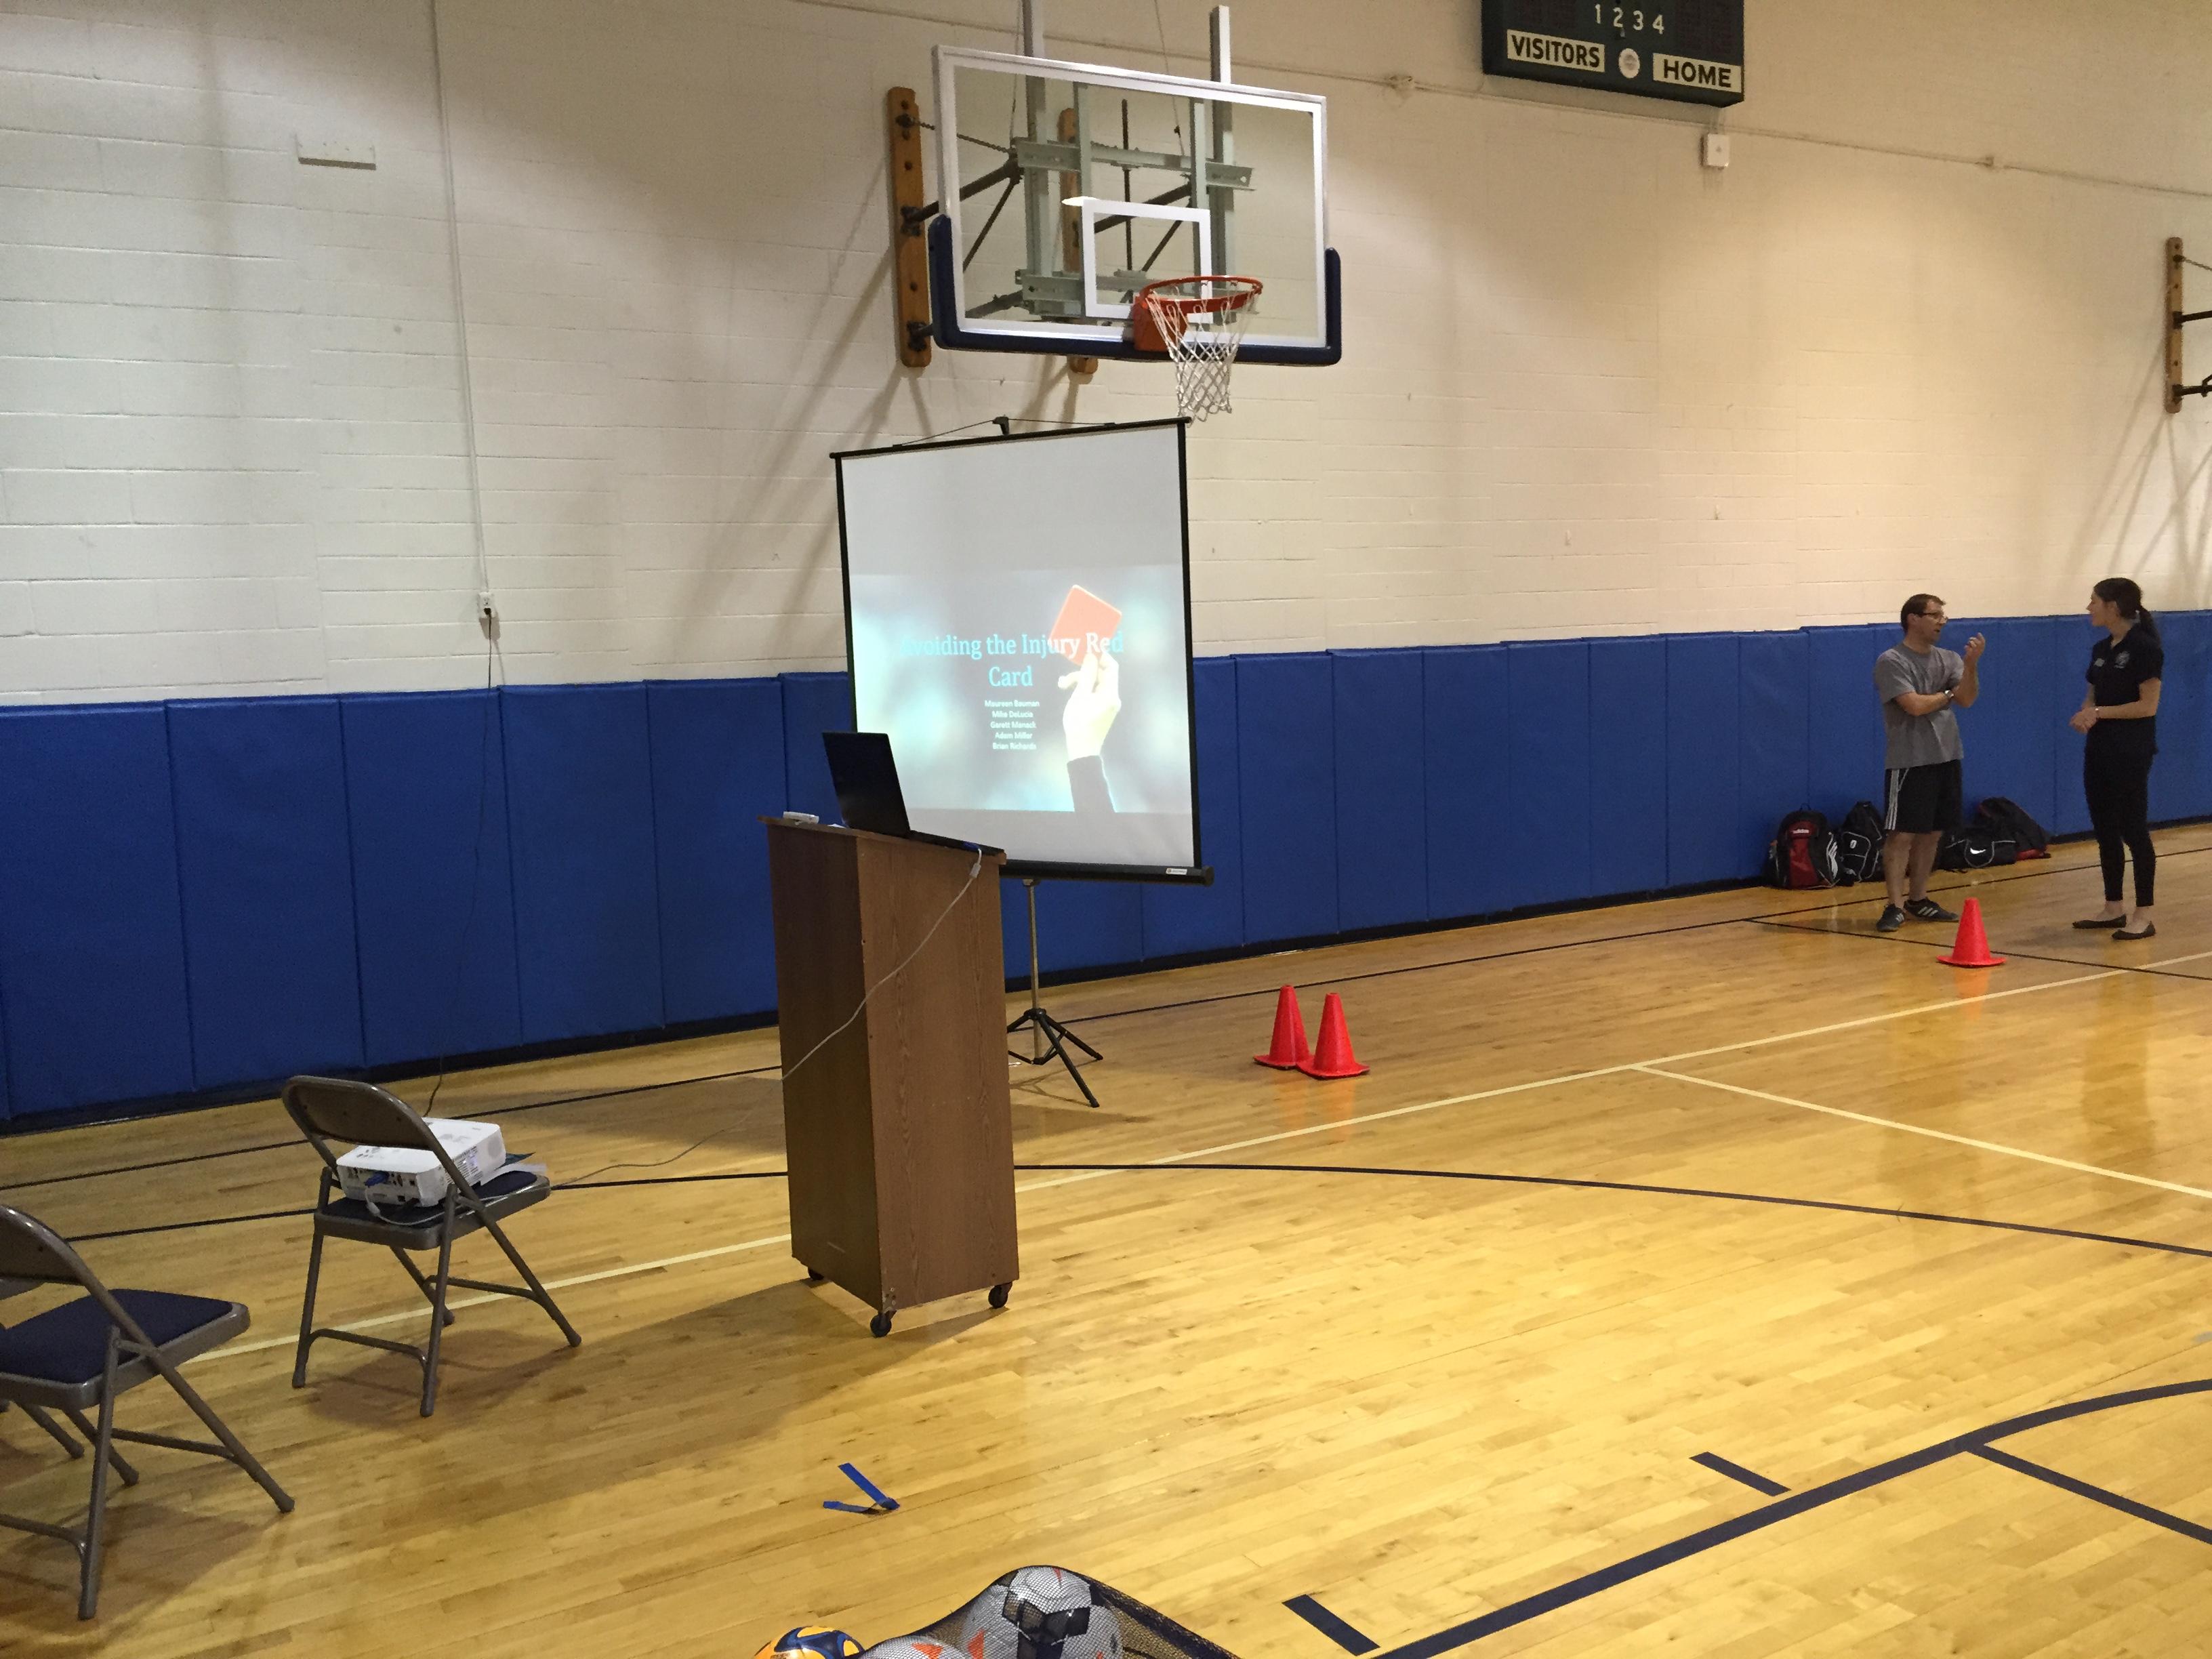 Artifact V Teaching Amp Learning Community Presentation